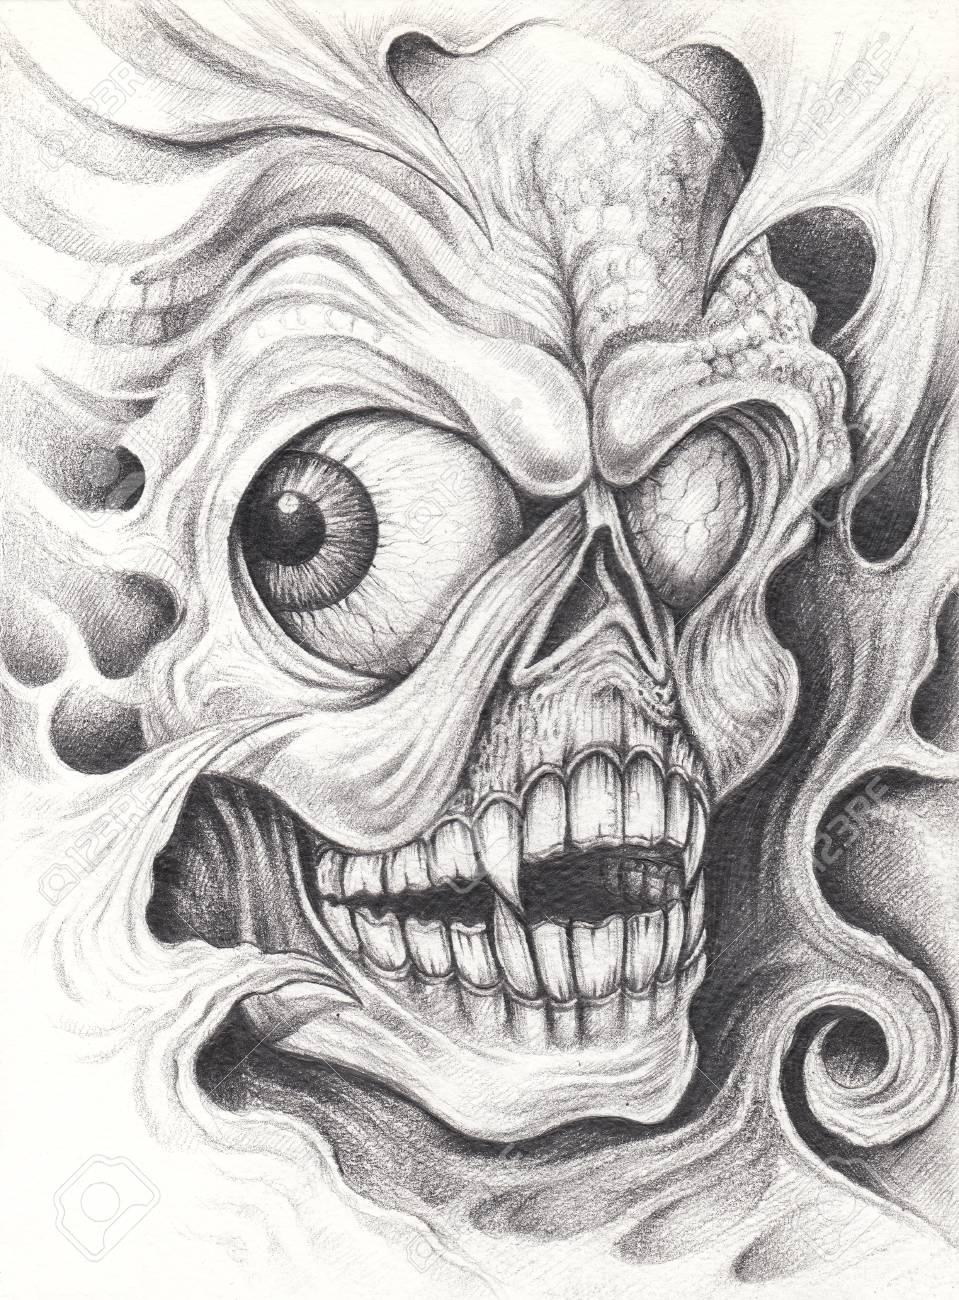 Art surreal skull tattoo hand pencil drawing on paper